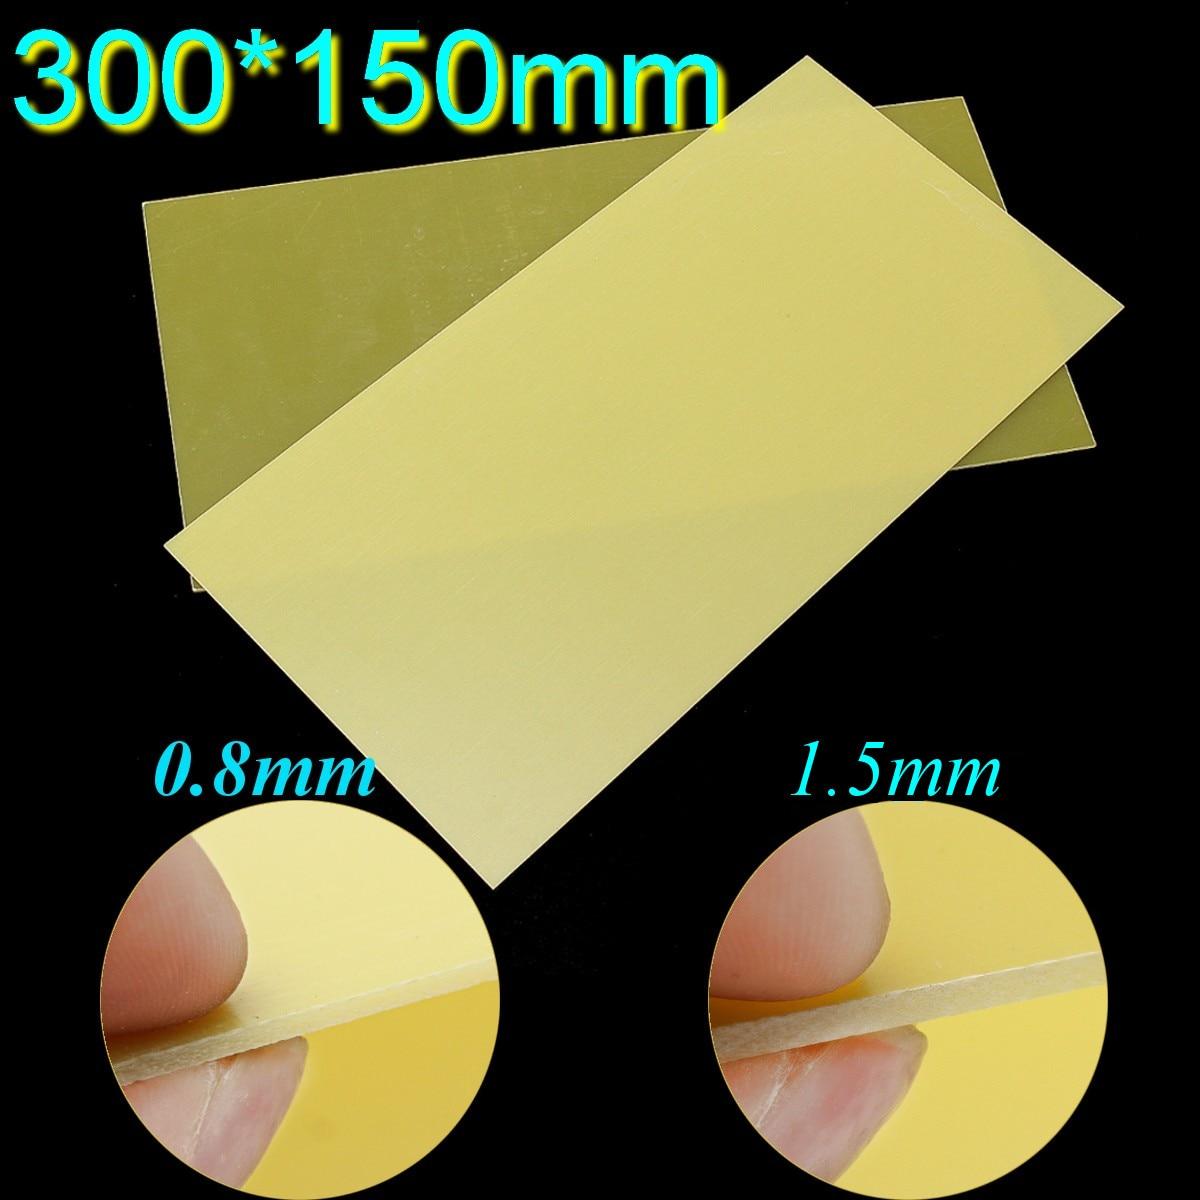 Glass Fiber G10 FR4 Epoxy Glass Cloth Board Plate 350 x 175mm Fiberglass Sheet